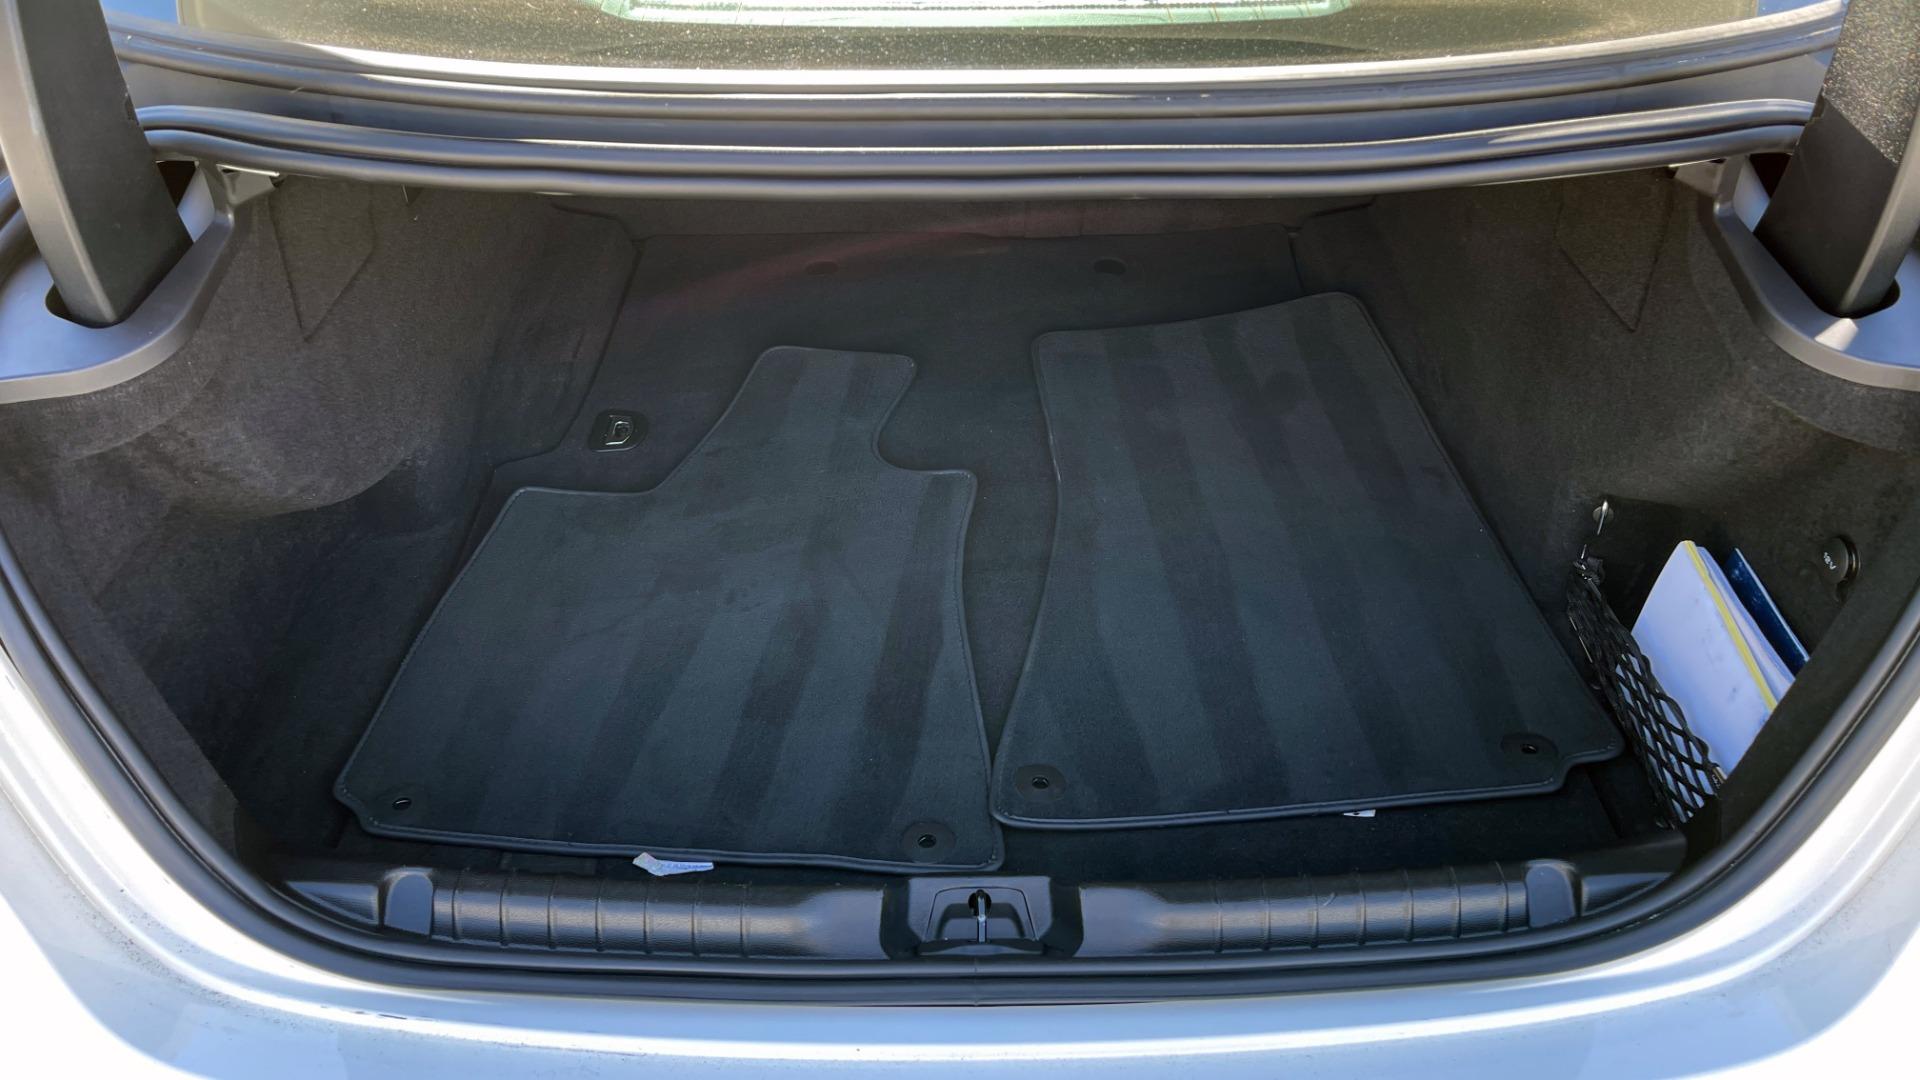 Used 2018 Maserati GHIBLI SEDAN / RWD / 3.0L V6 / SUNROOF / NAV / REARVIEW for sale $42,995 at Formula Imports in Charlotte NC 28227 20